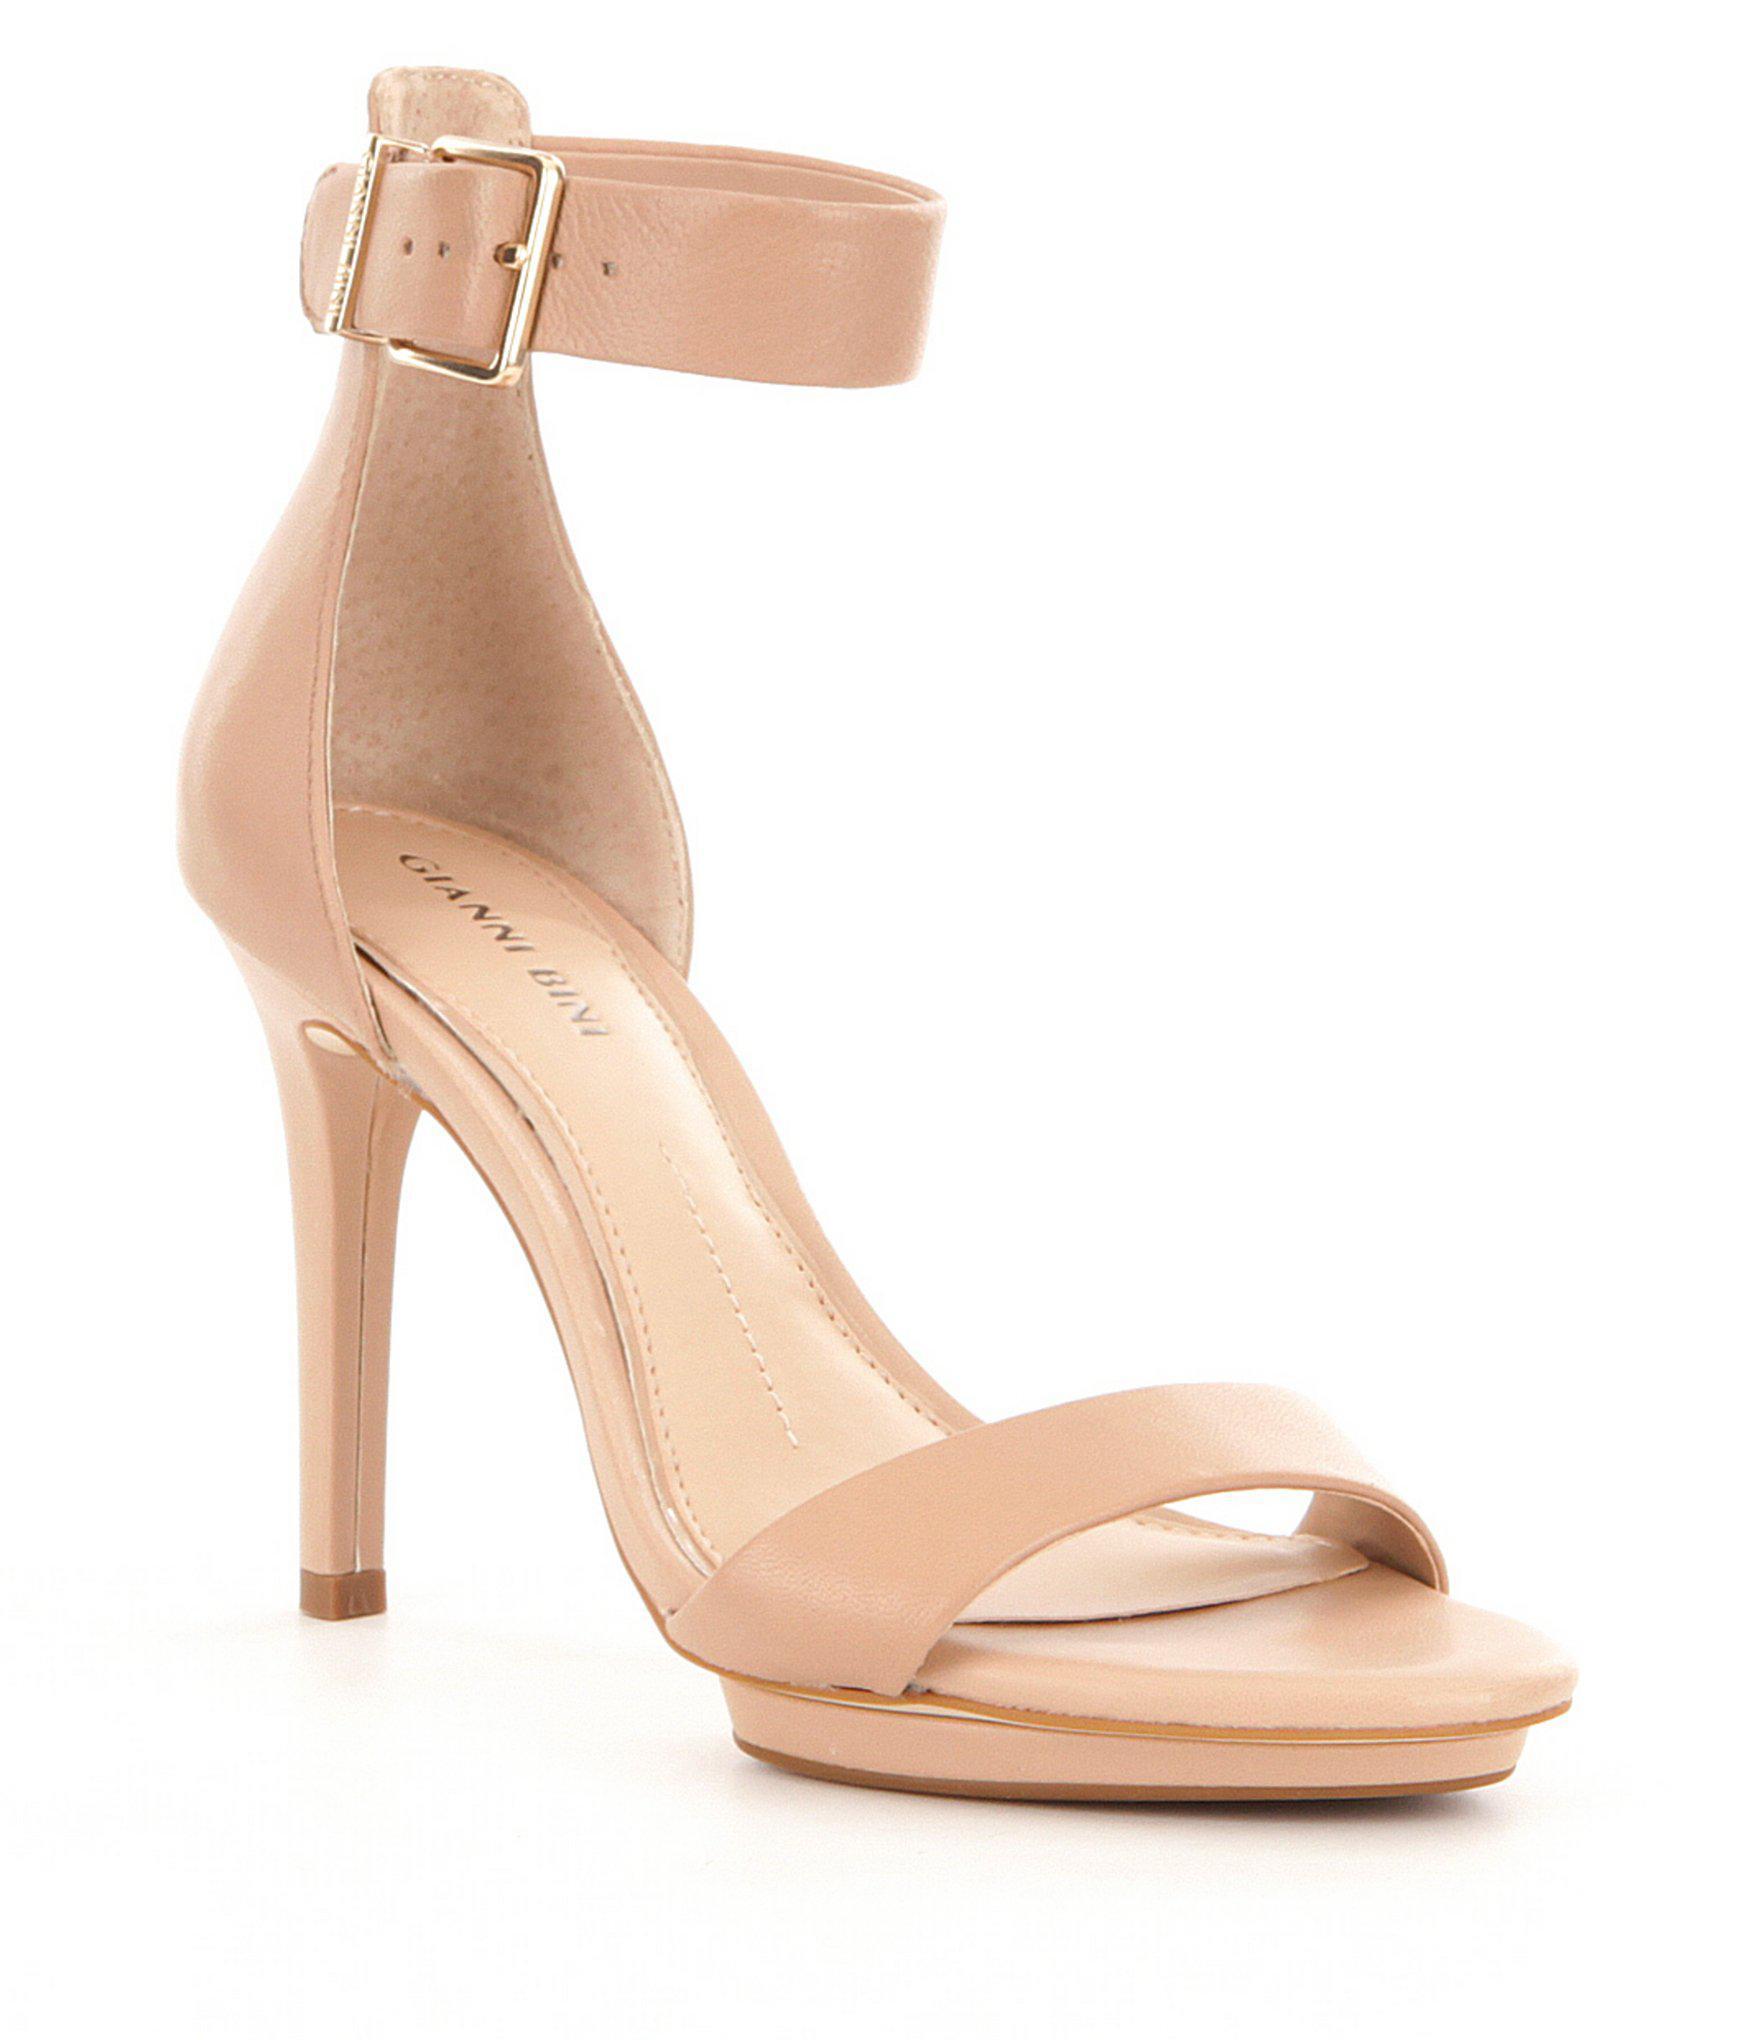 54ffbc485a4 Gianni Bini Lizette Dress Sandals in Pink - Lyst